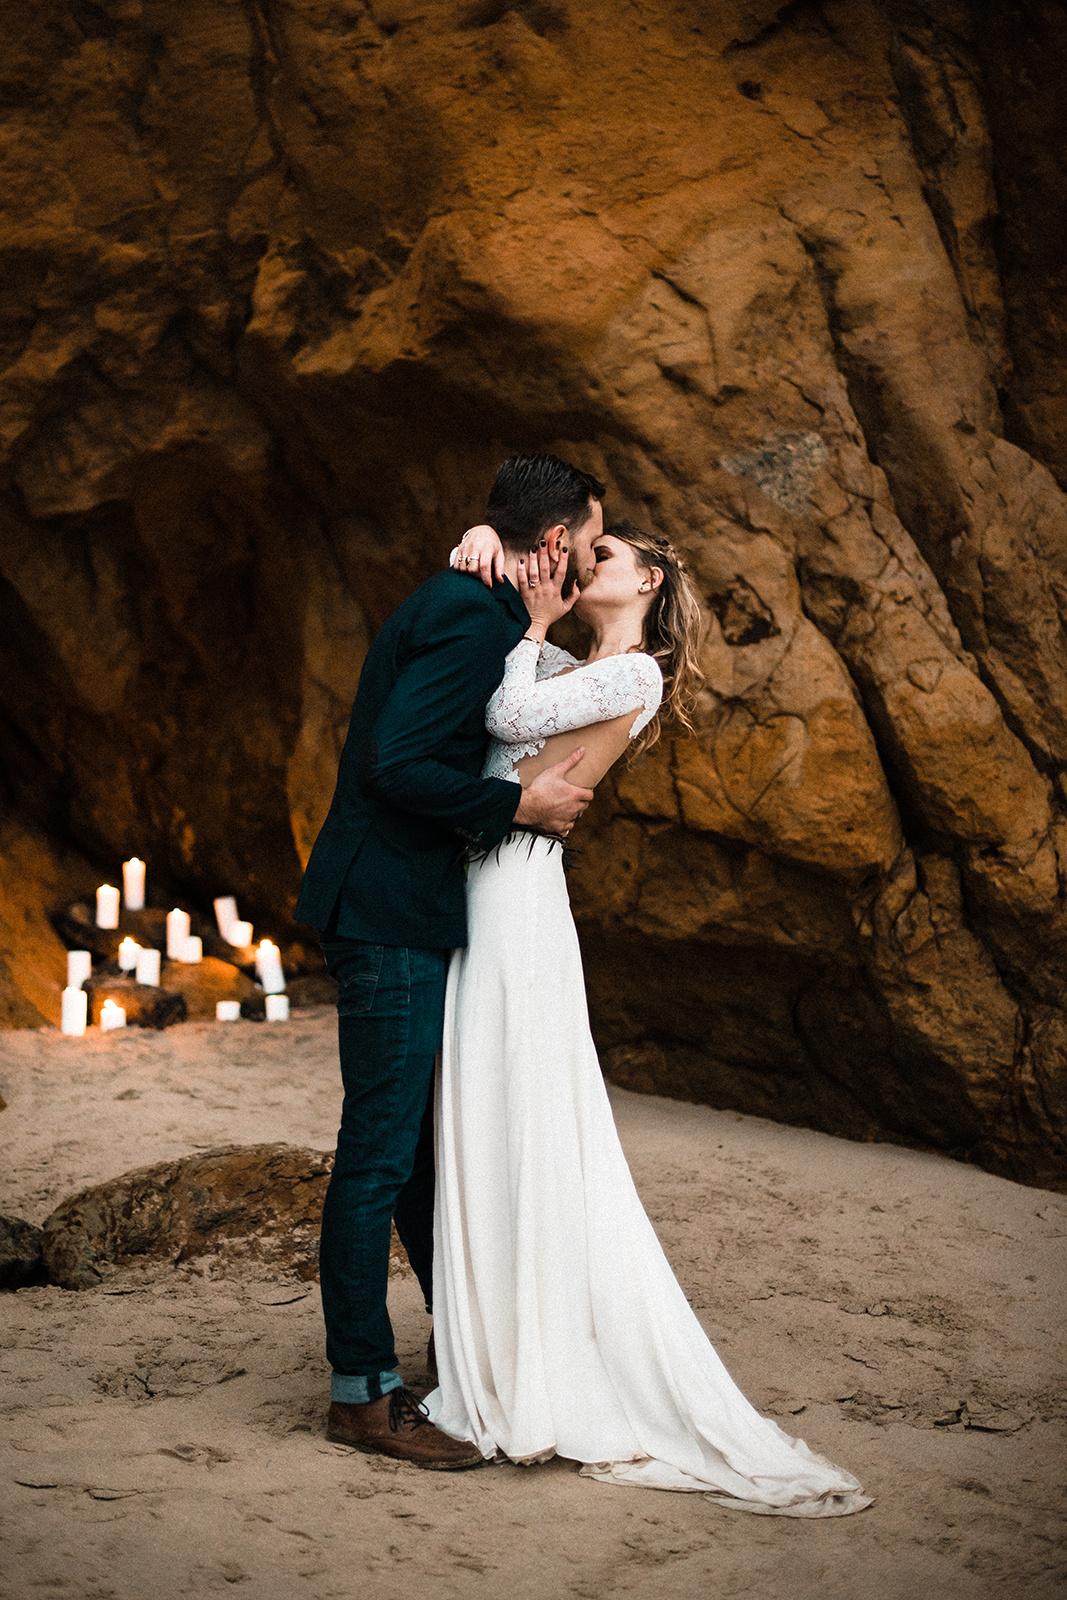 Oregon_Coast_Elopement_Wedding_The_Foxes_Photography_156.jpg